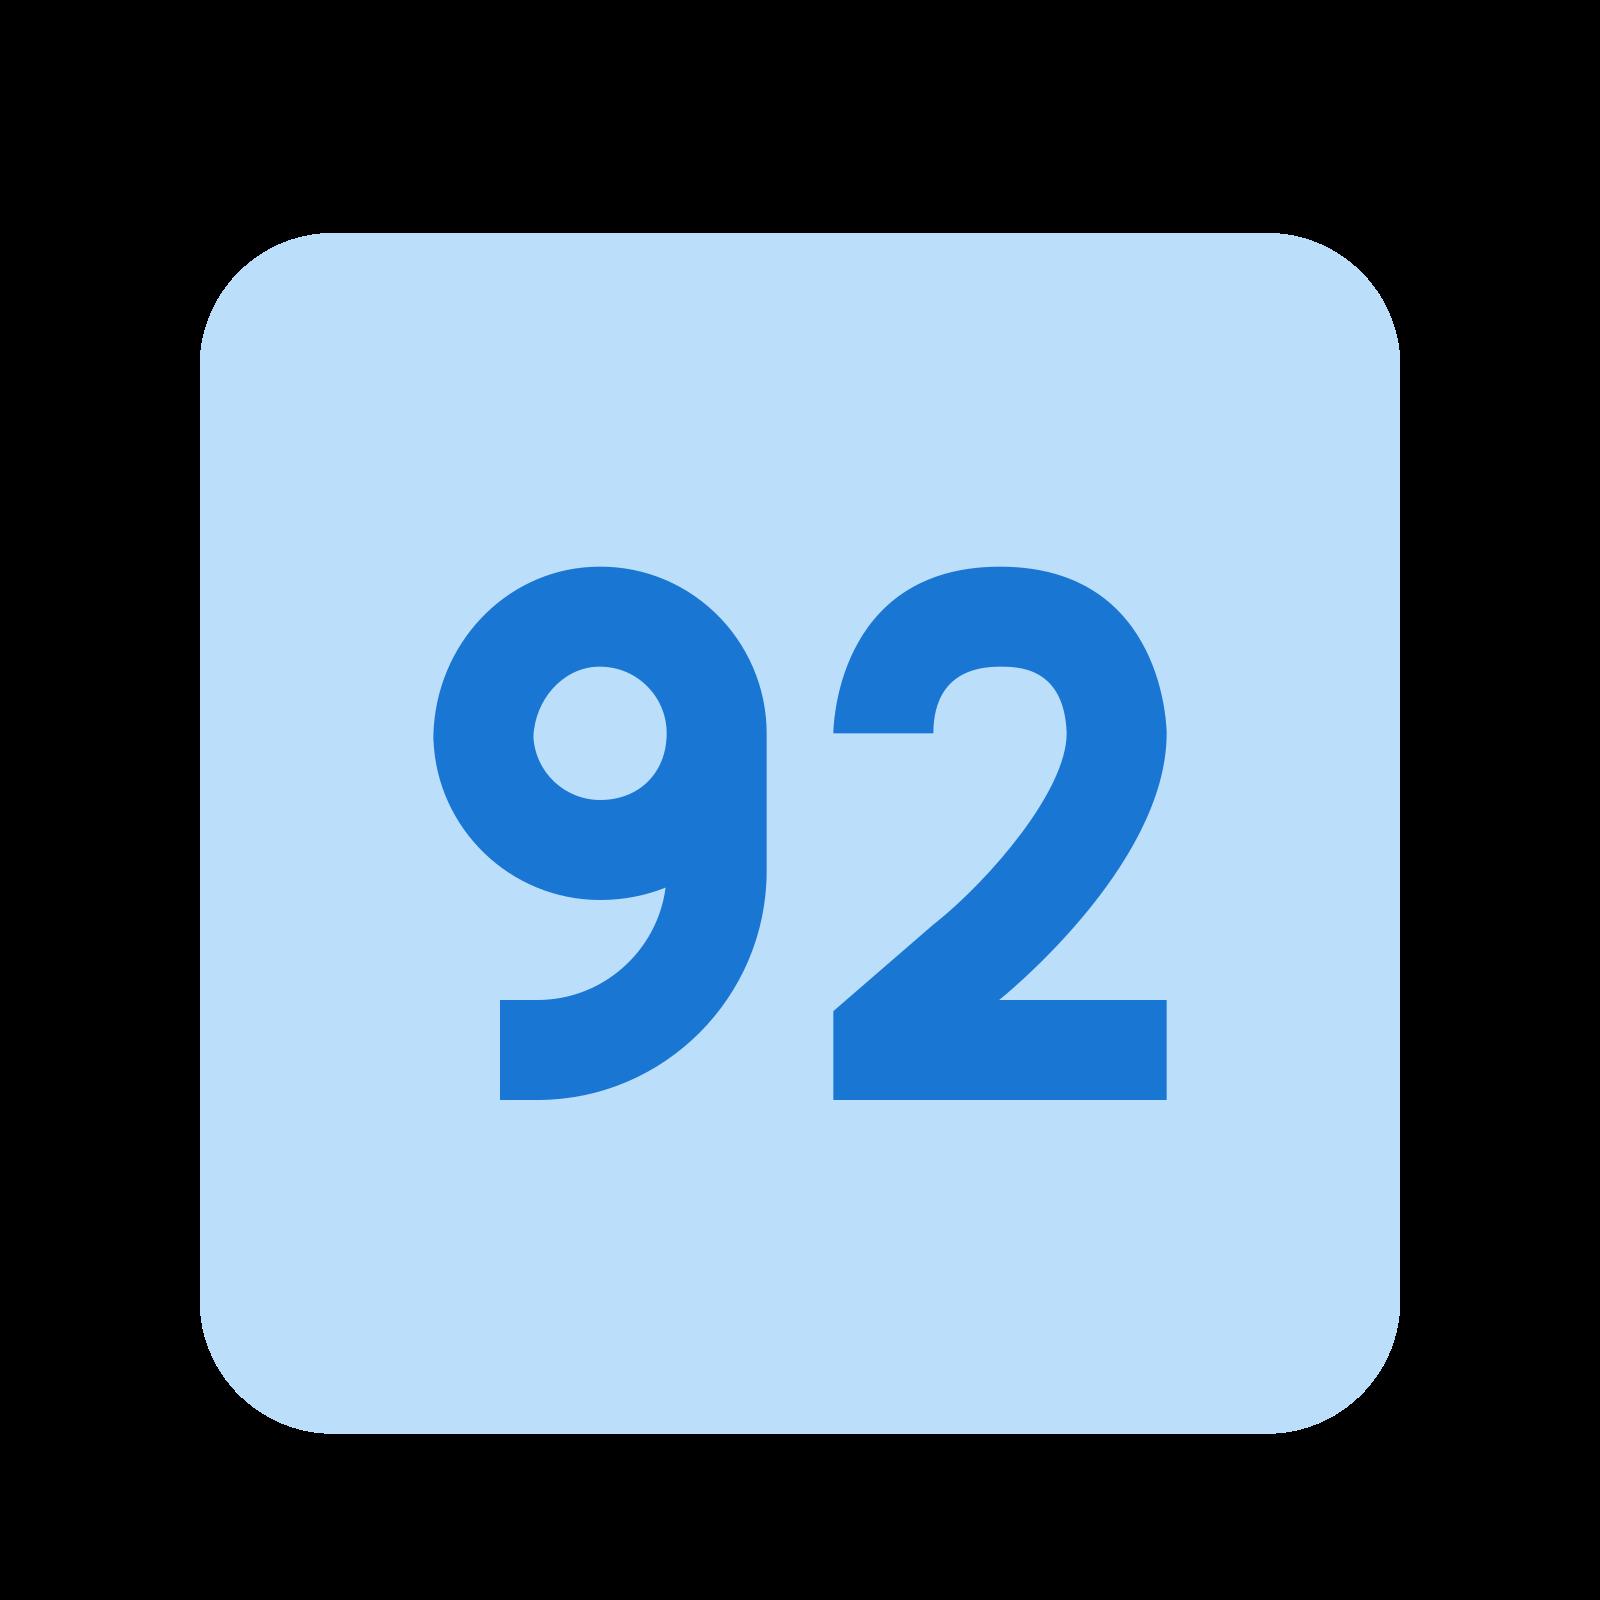 92 icon